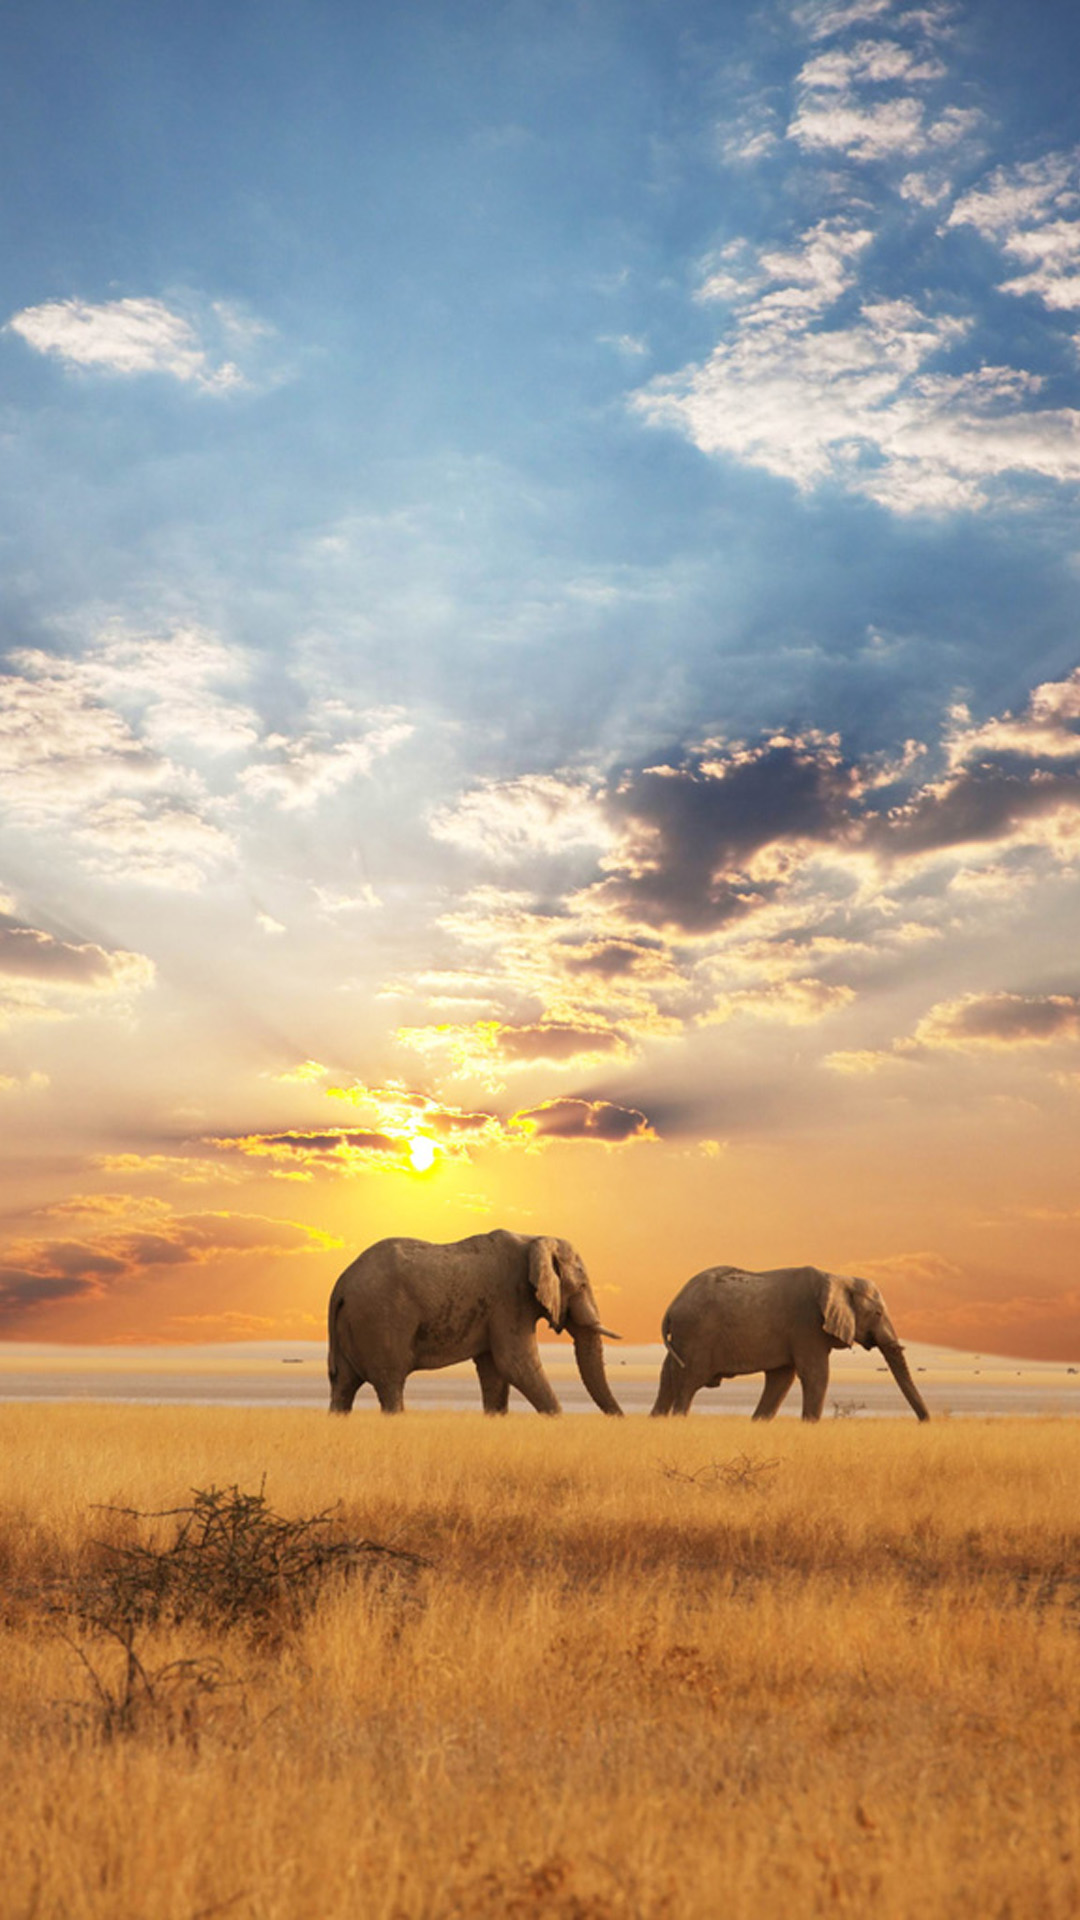 african elephant wallpaper wallpapersafari